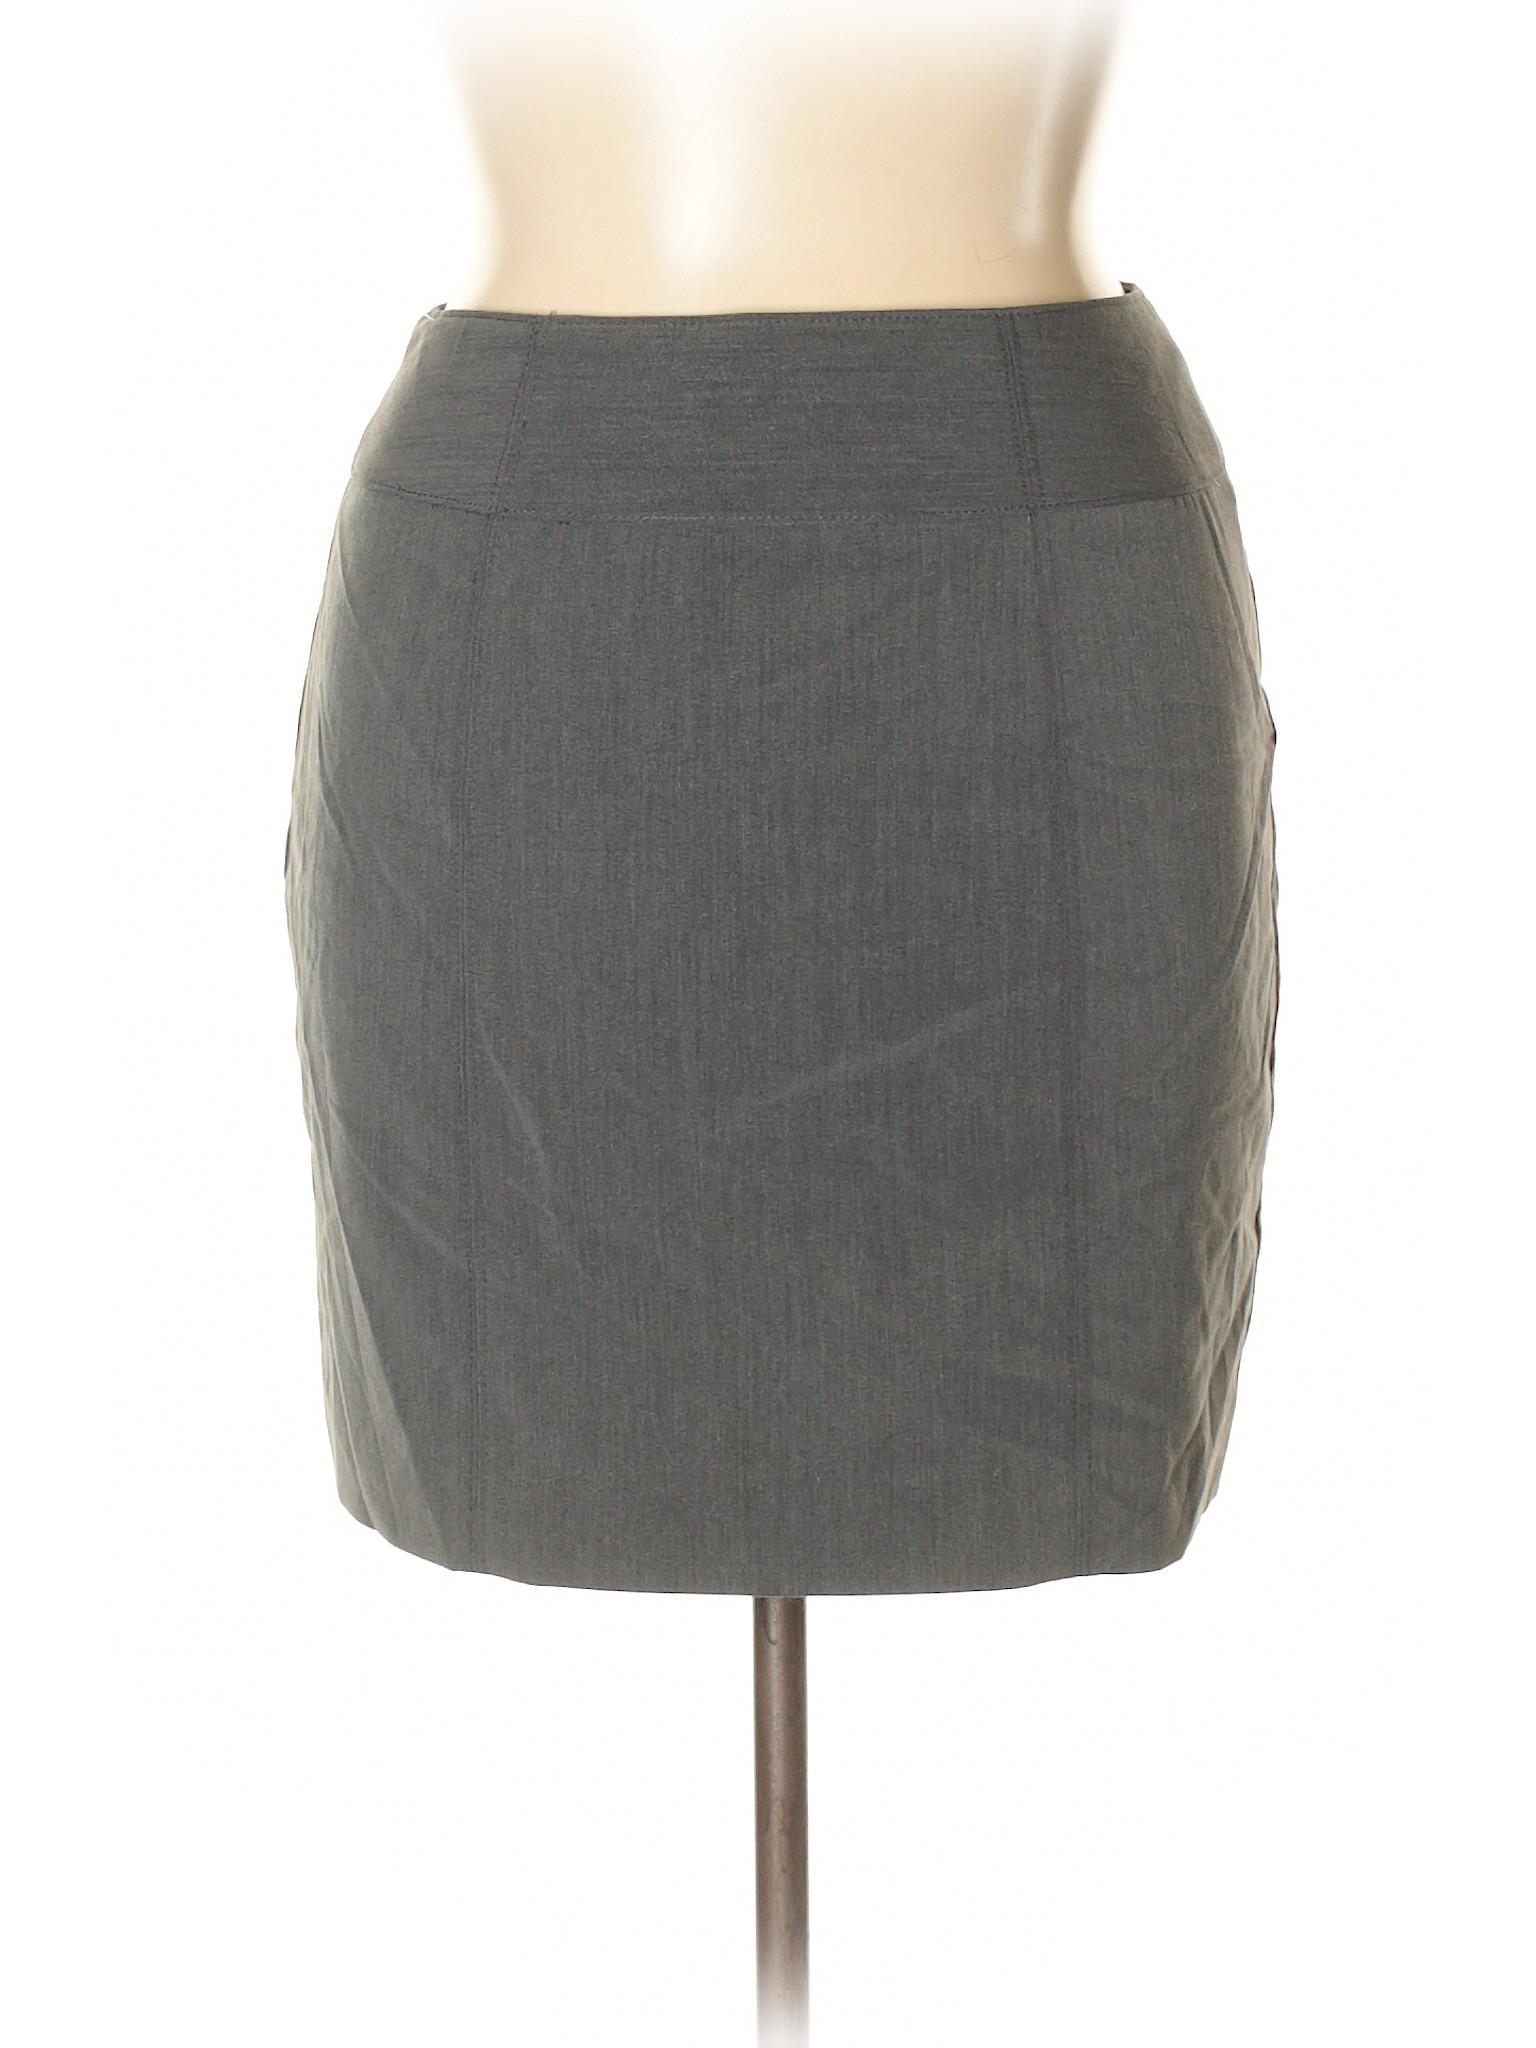 Boutique Worthington Skirt Boutique Skirt Worthington Casual Worthington Skirt Casual Boutique Boutique Casual 48Fzg